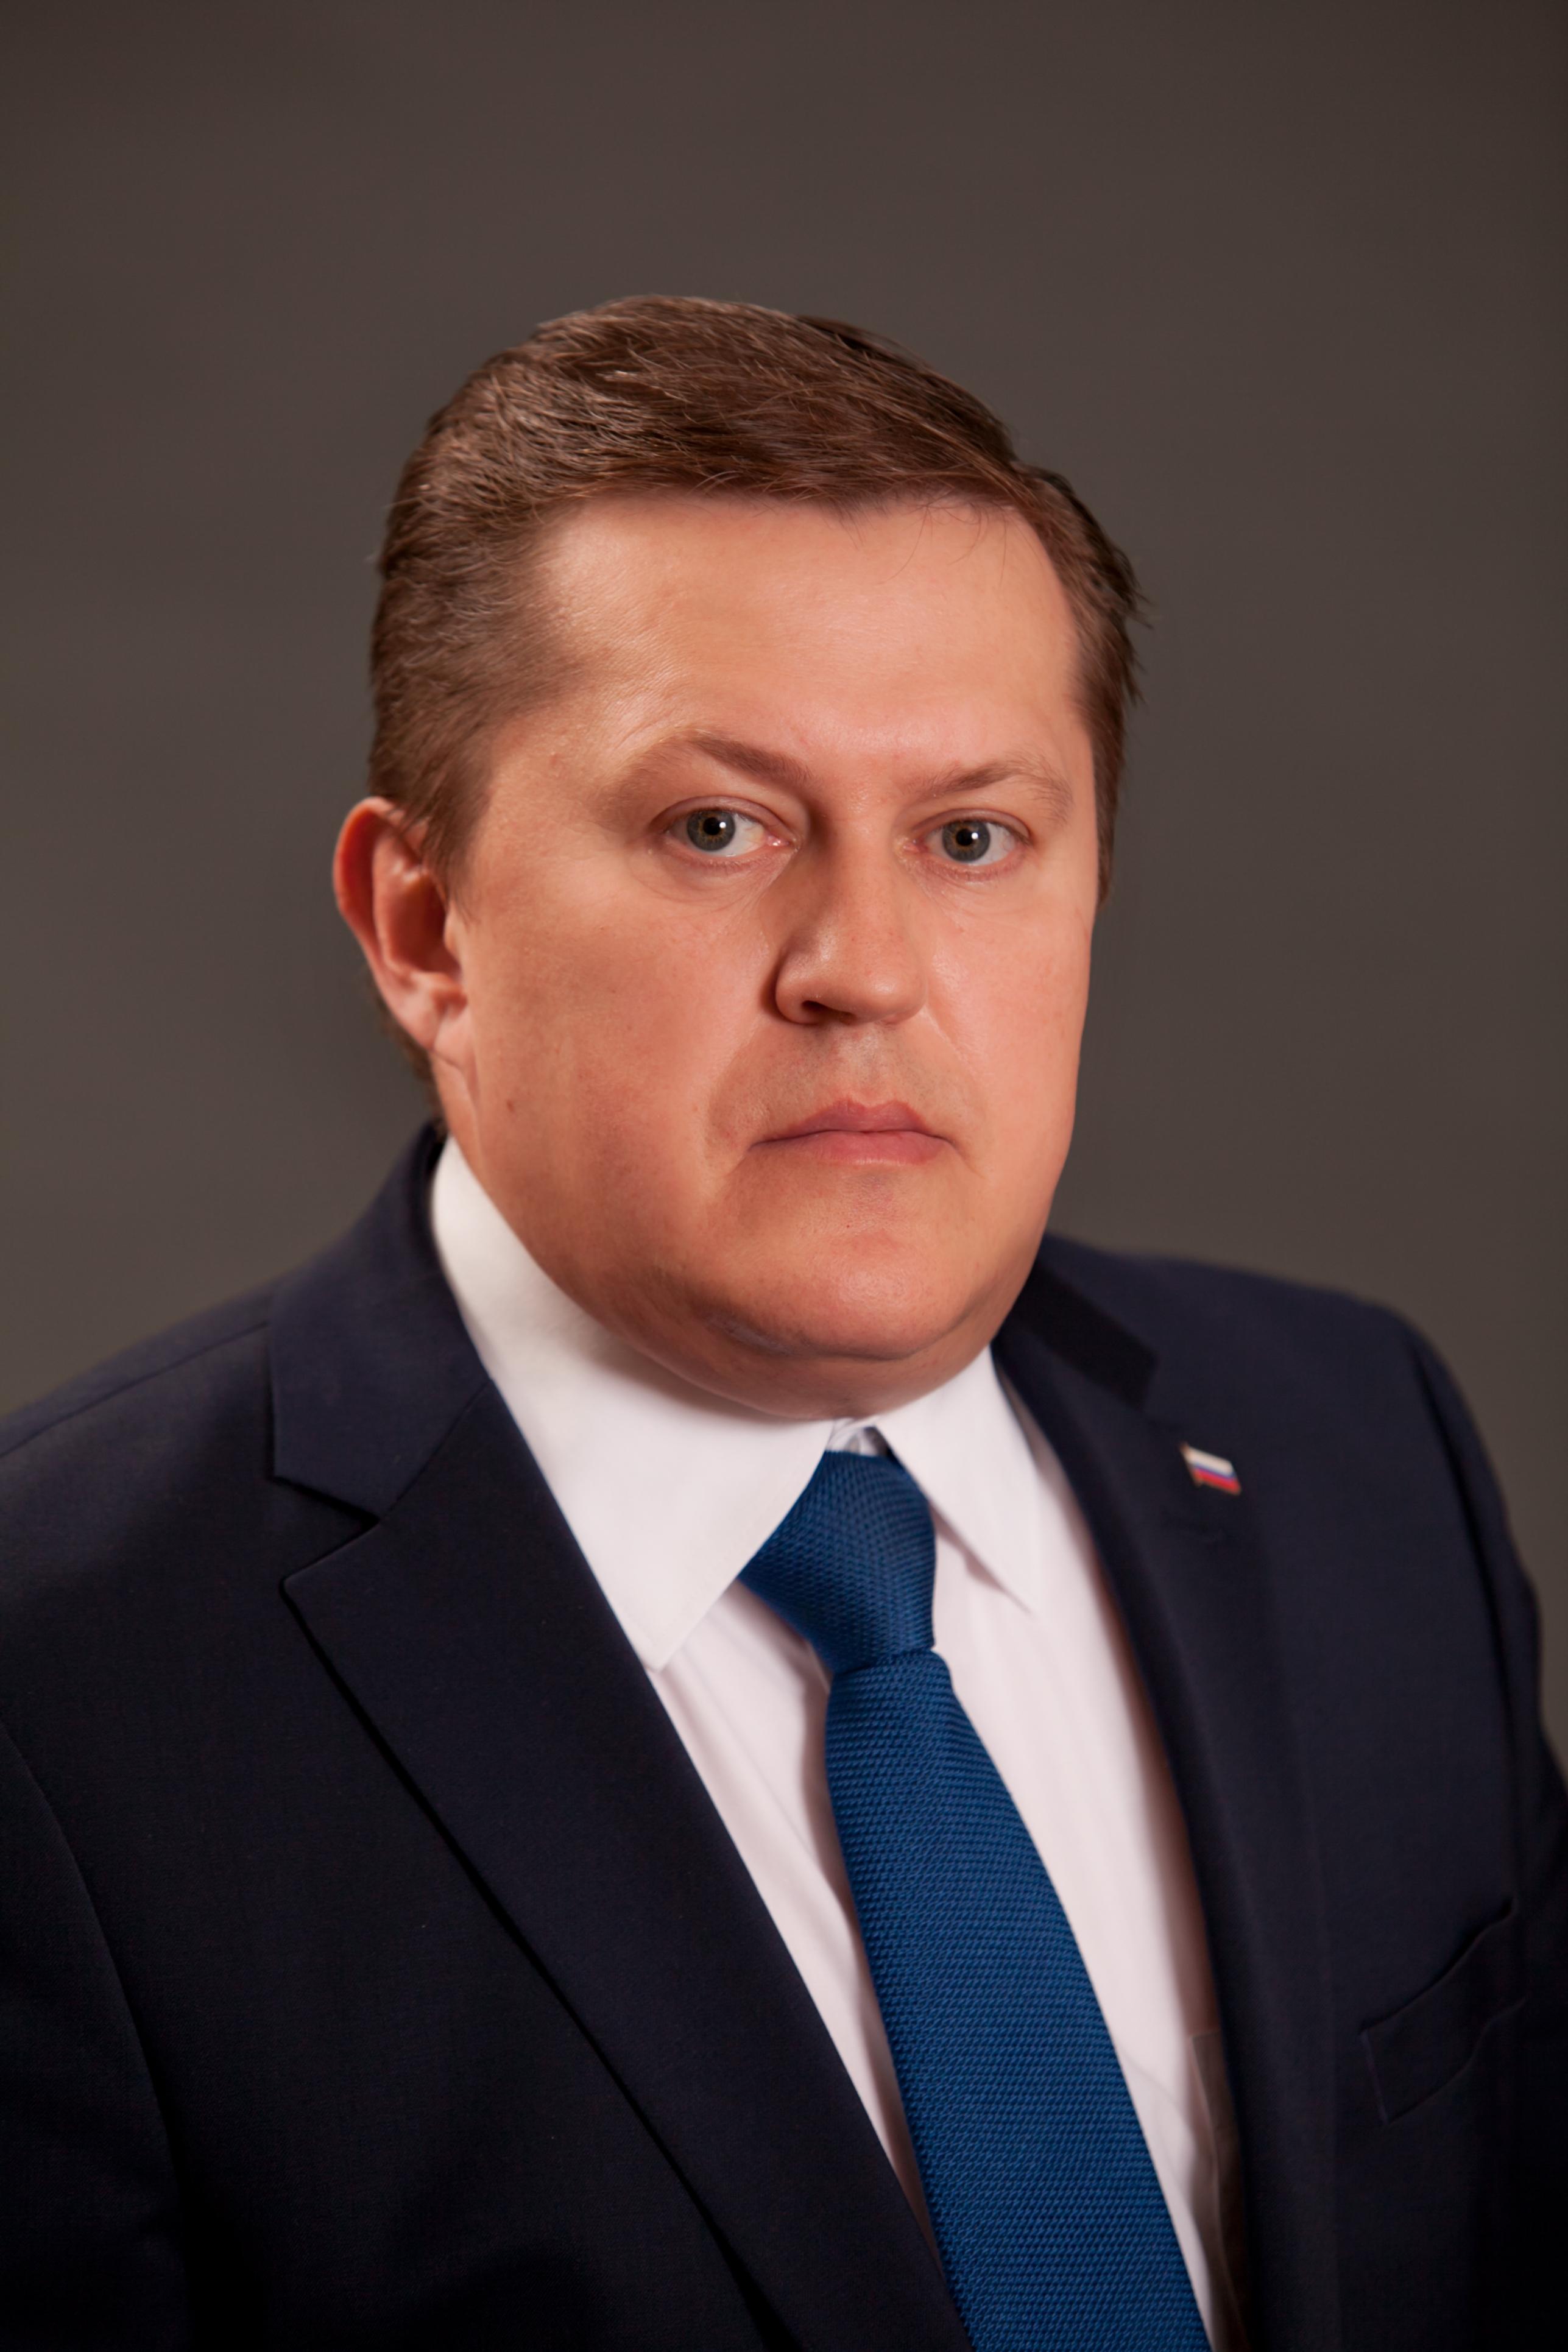 Кудрявцев Вадим Анатольевич